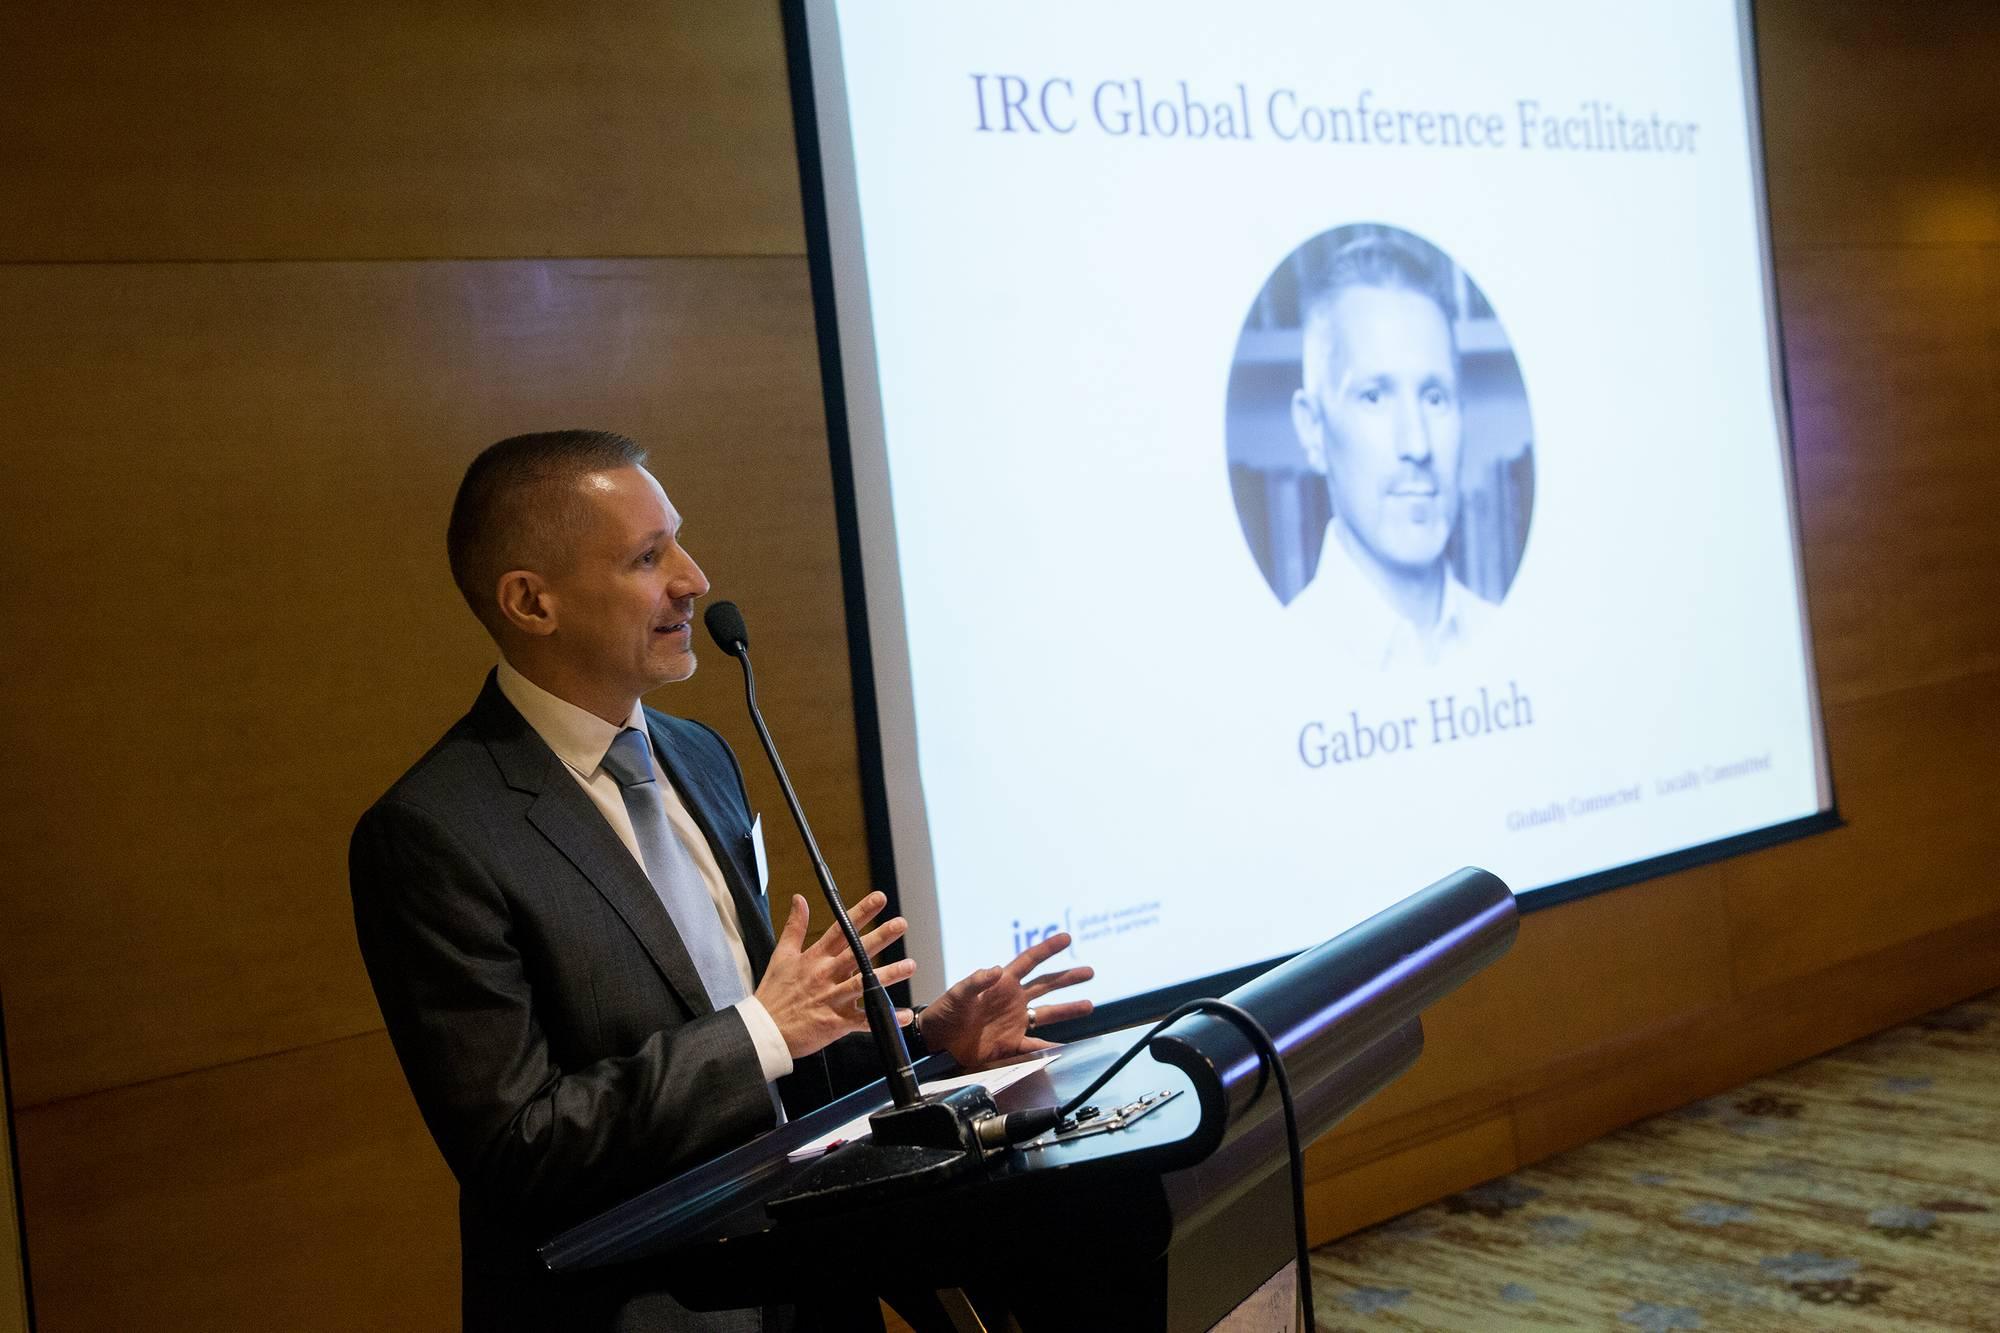 IRC Shanghai - Gabor Holch